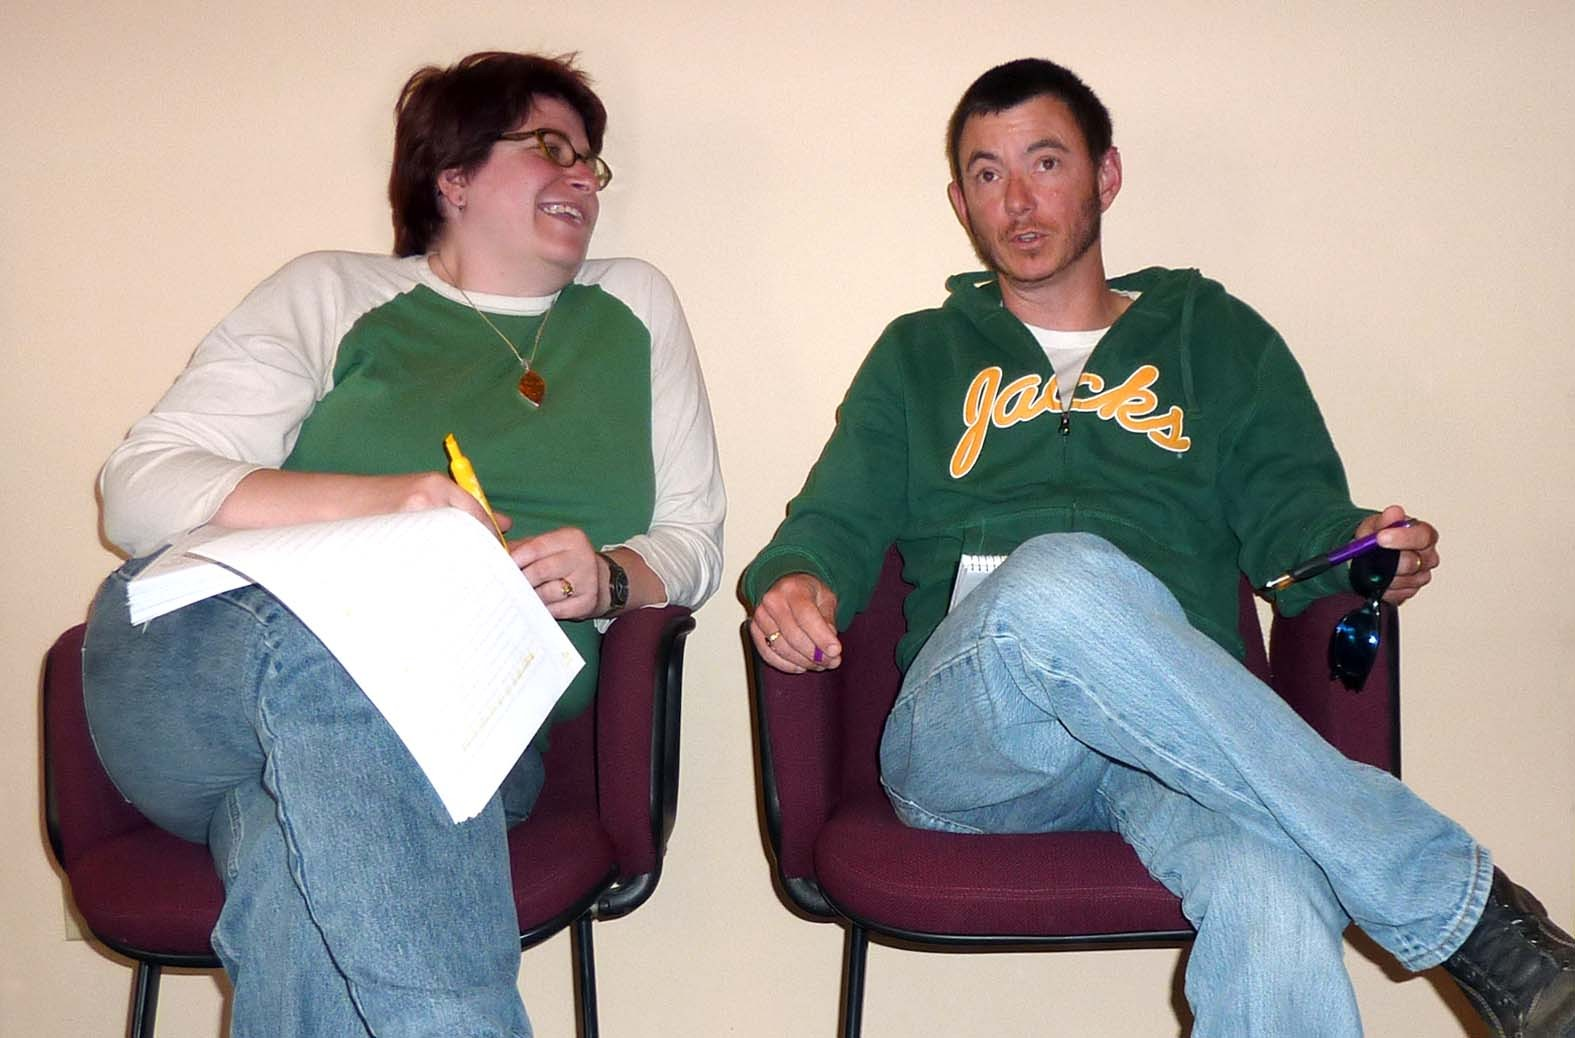 Jessica Pettitt and Dr. Loren Cannon. - PHOTO BY RYAN BURNS